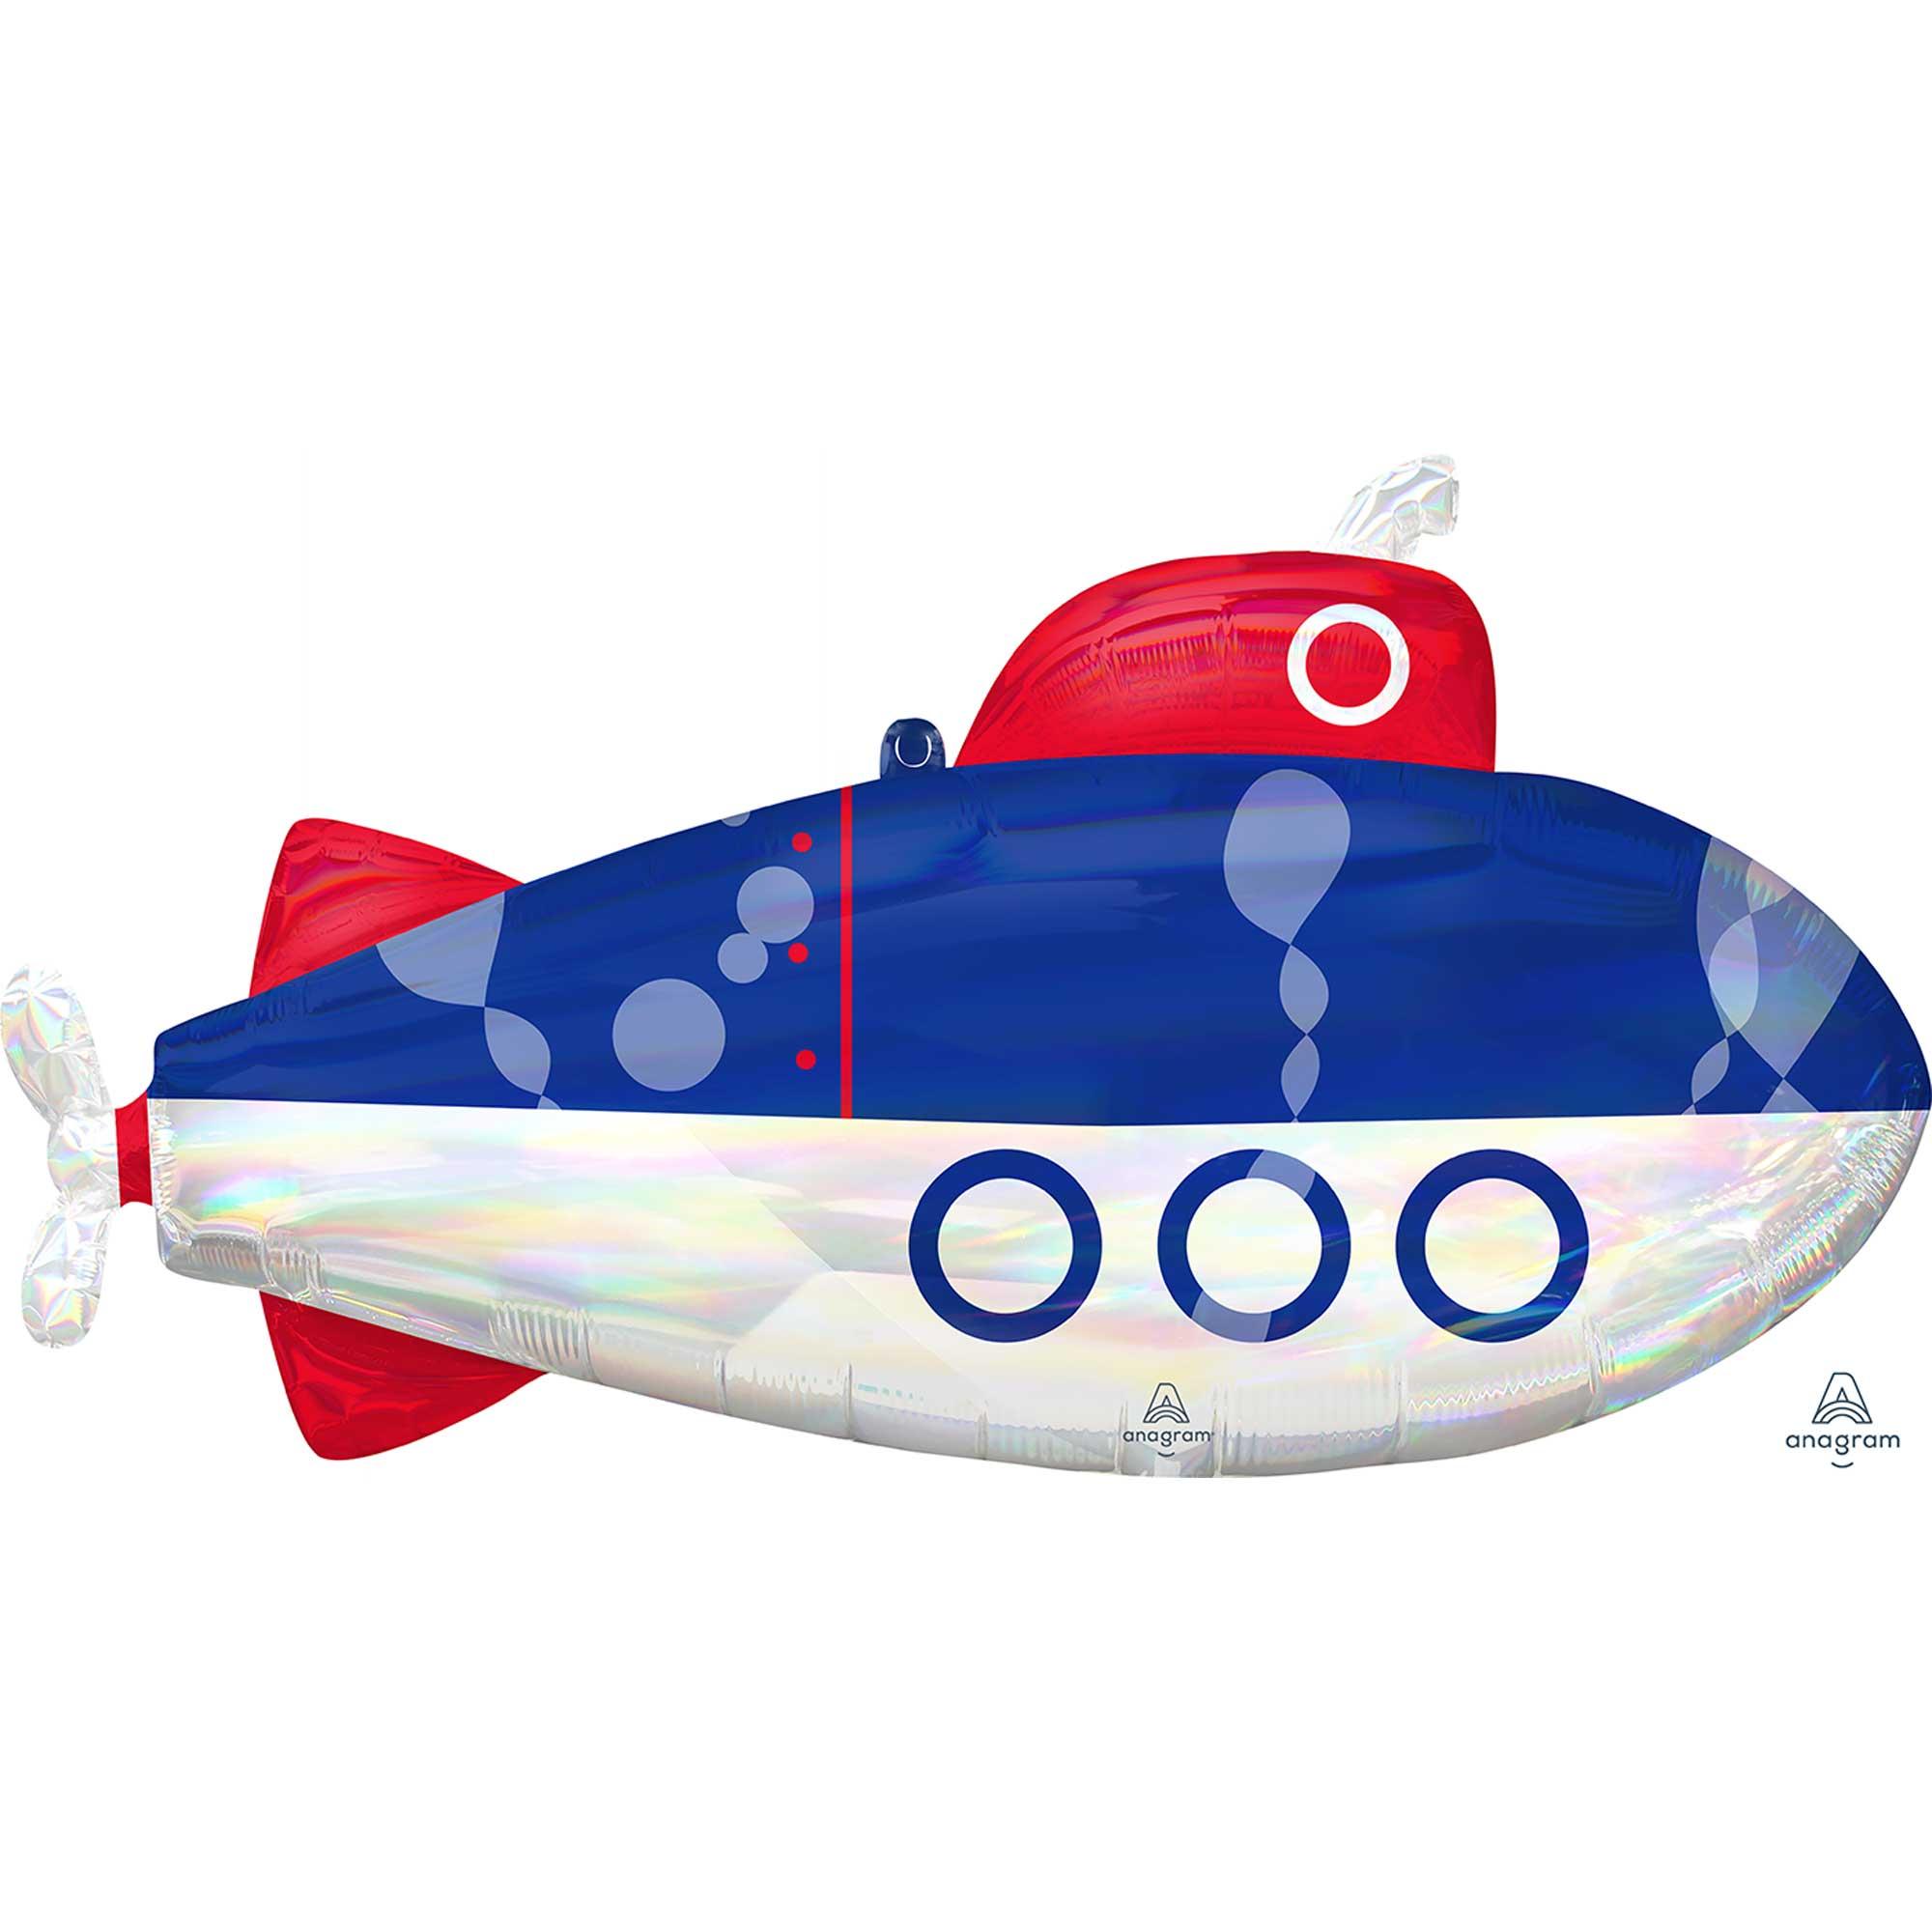 SuperShape Holographic Iridescent Submarine P40